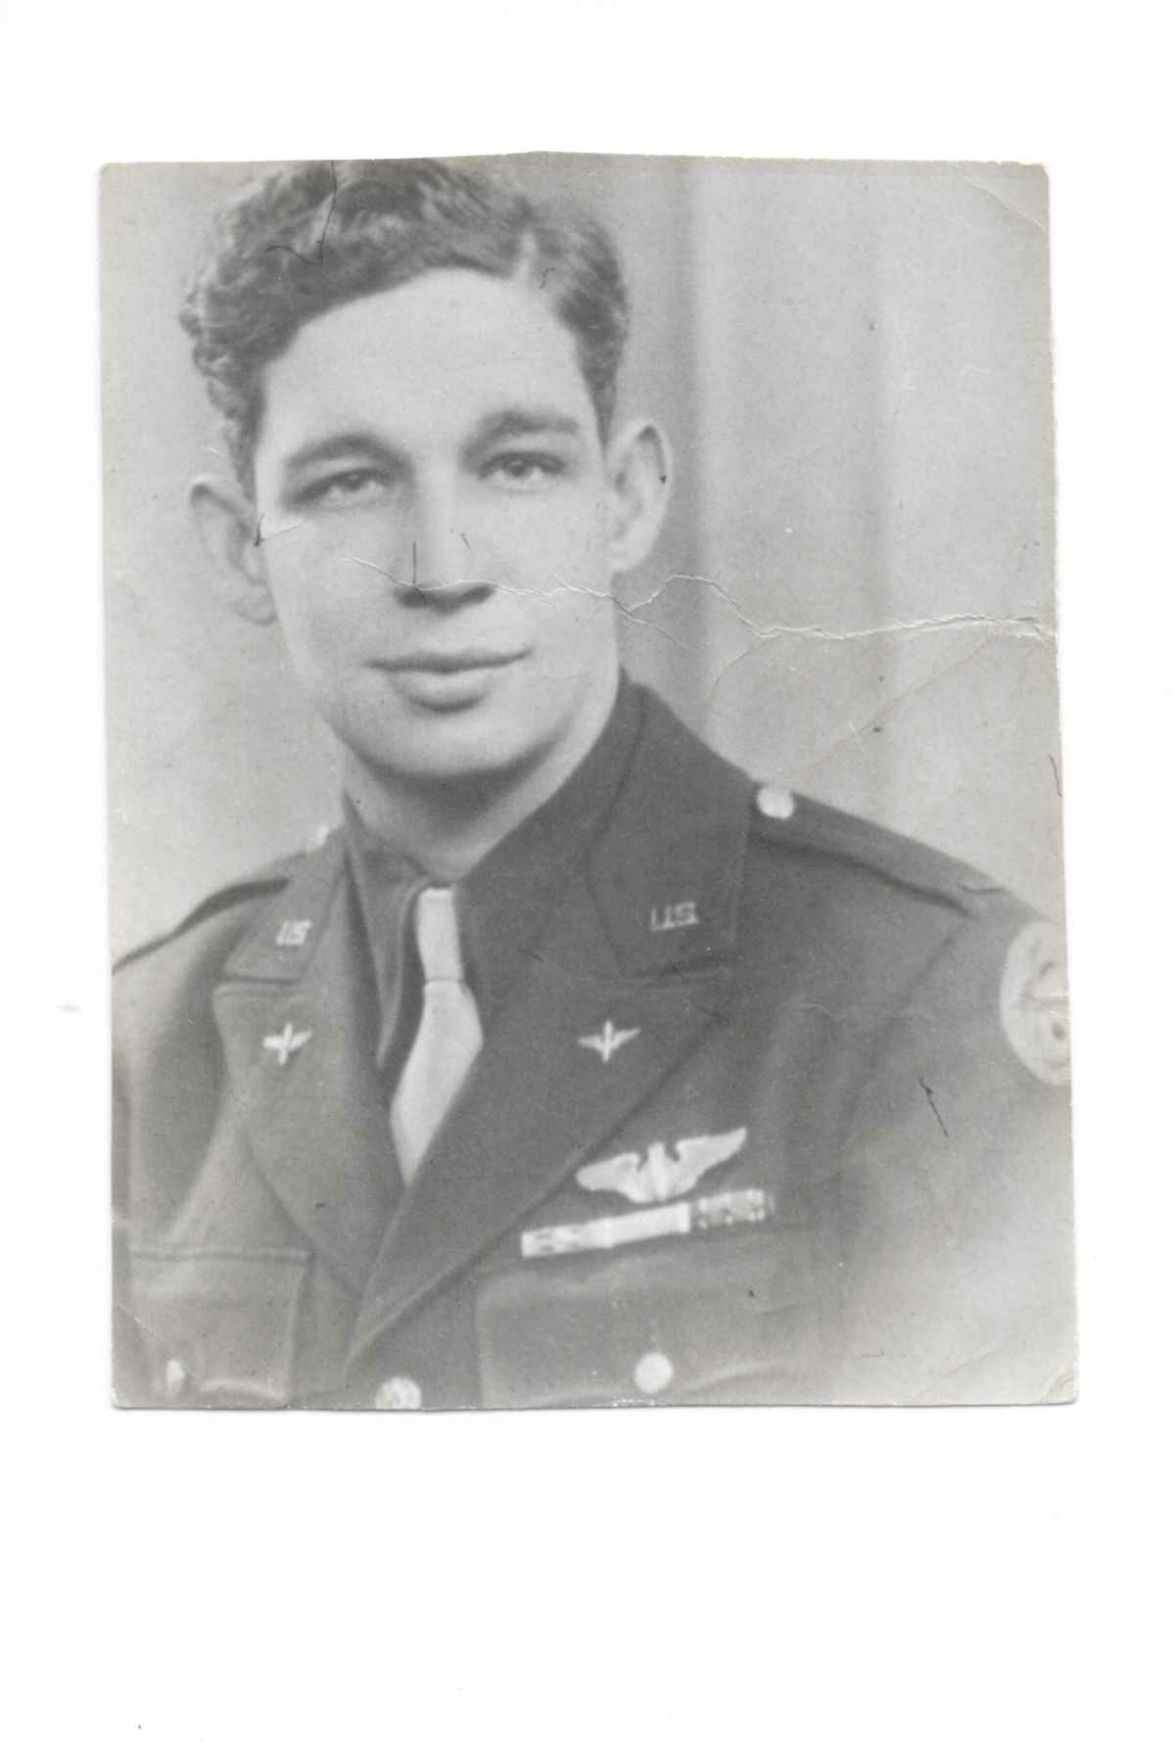 Capt. James M. Kirk